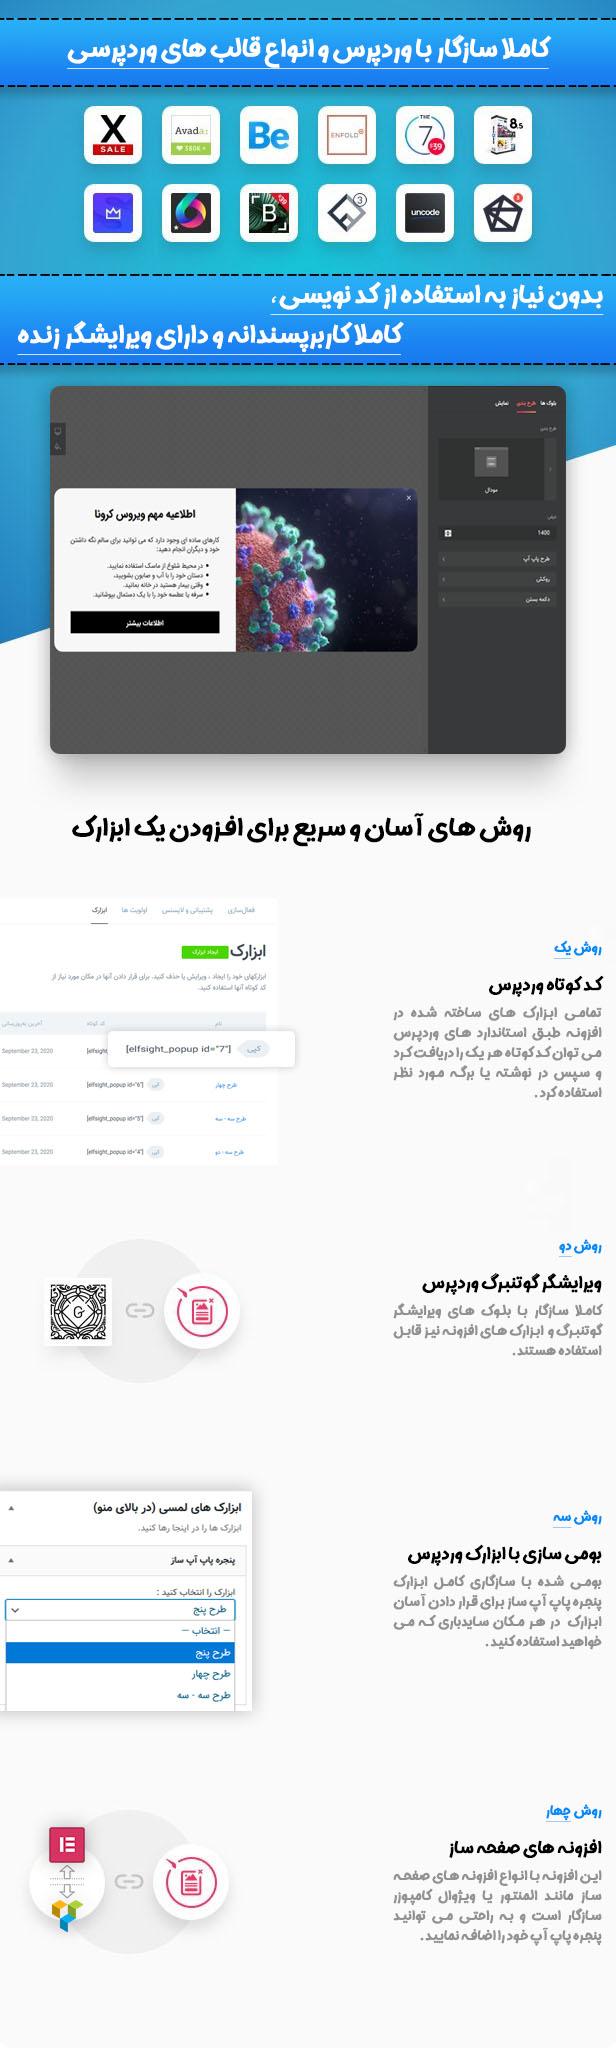 افزونه پنجره پاپ آپ ساز وردپرس - Popup Maker 3